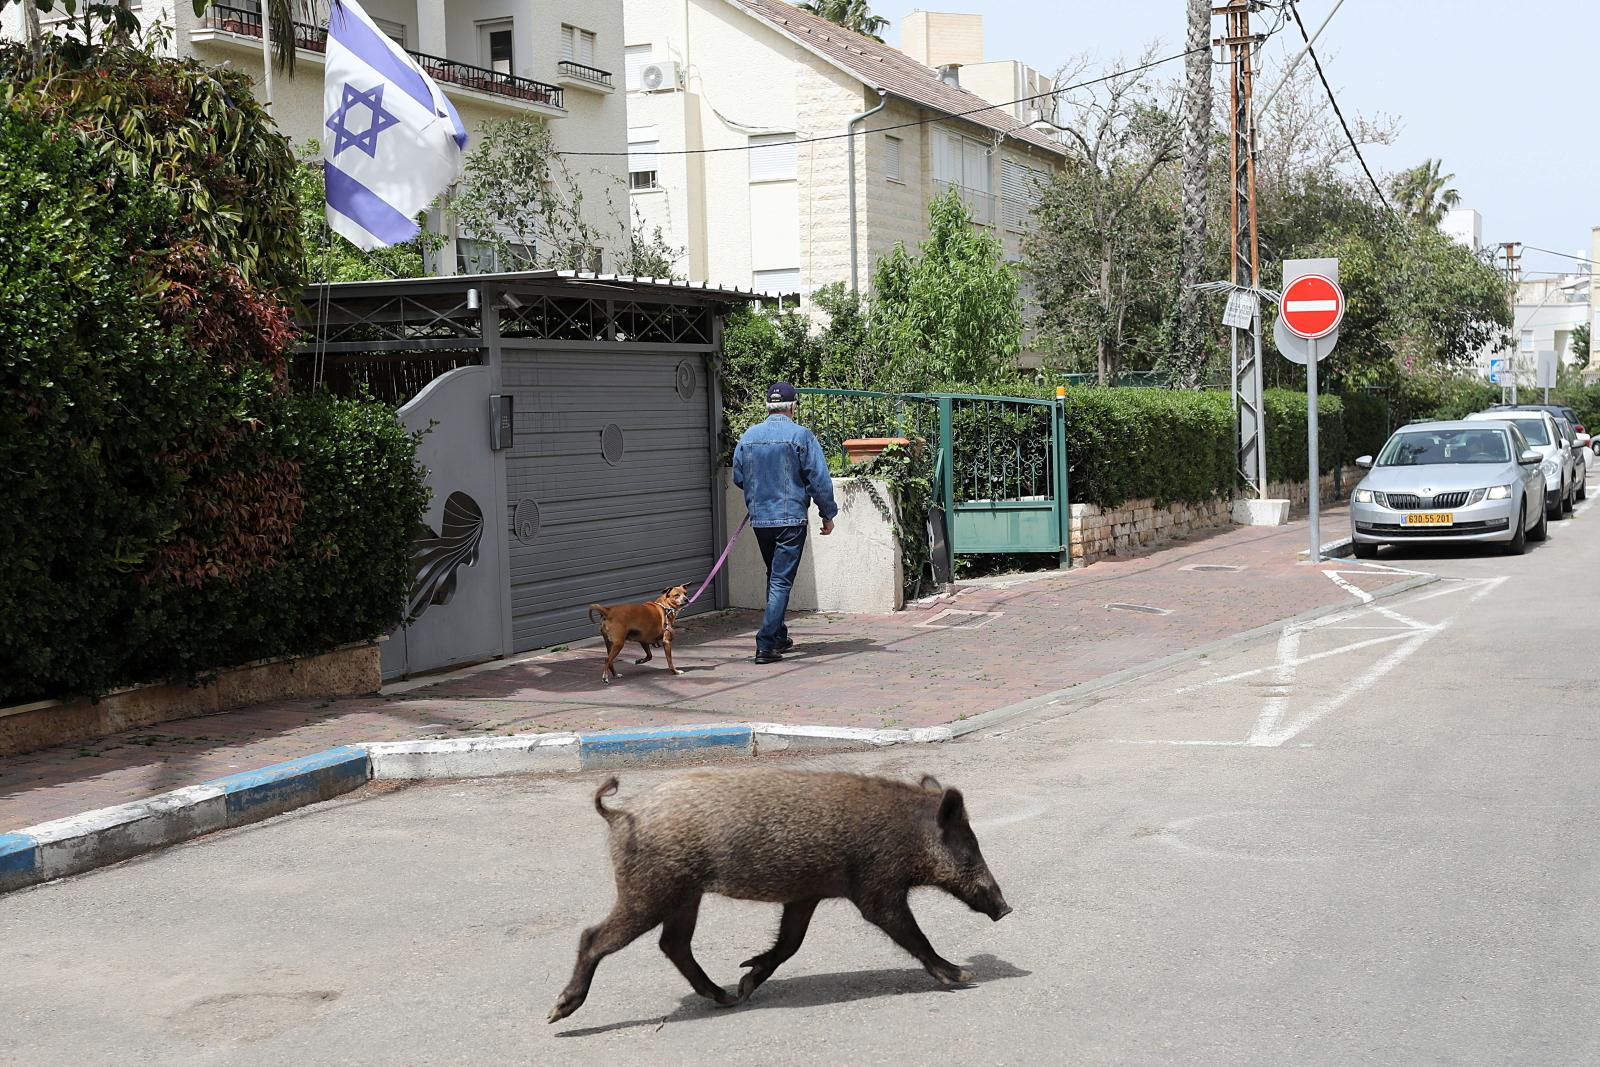 Ulice podczas pandemii koronawirusa w Izraelu fot. EPA/ABIR SULTAN